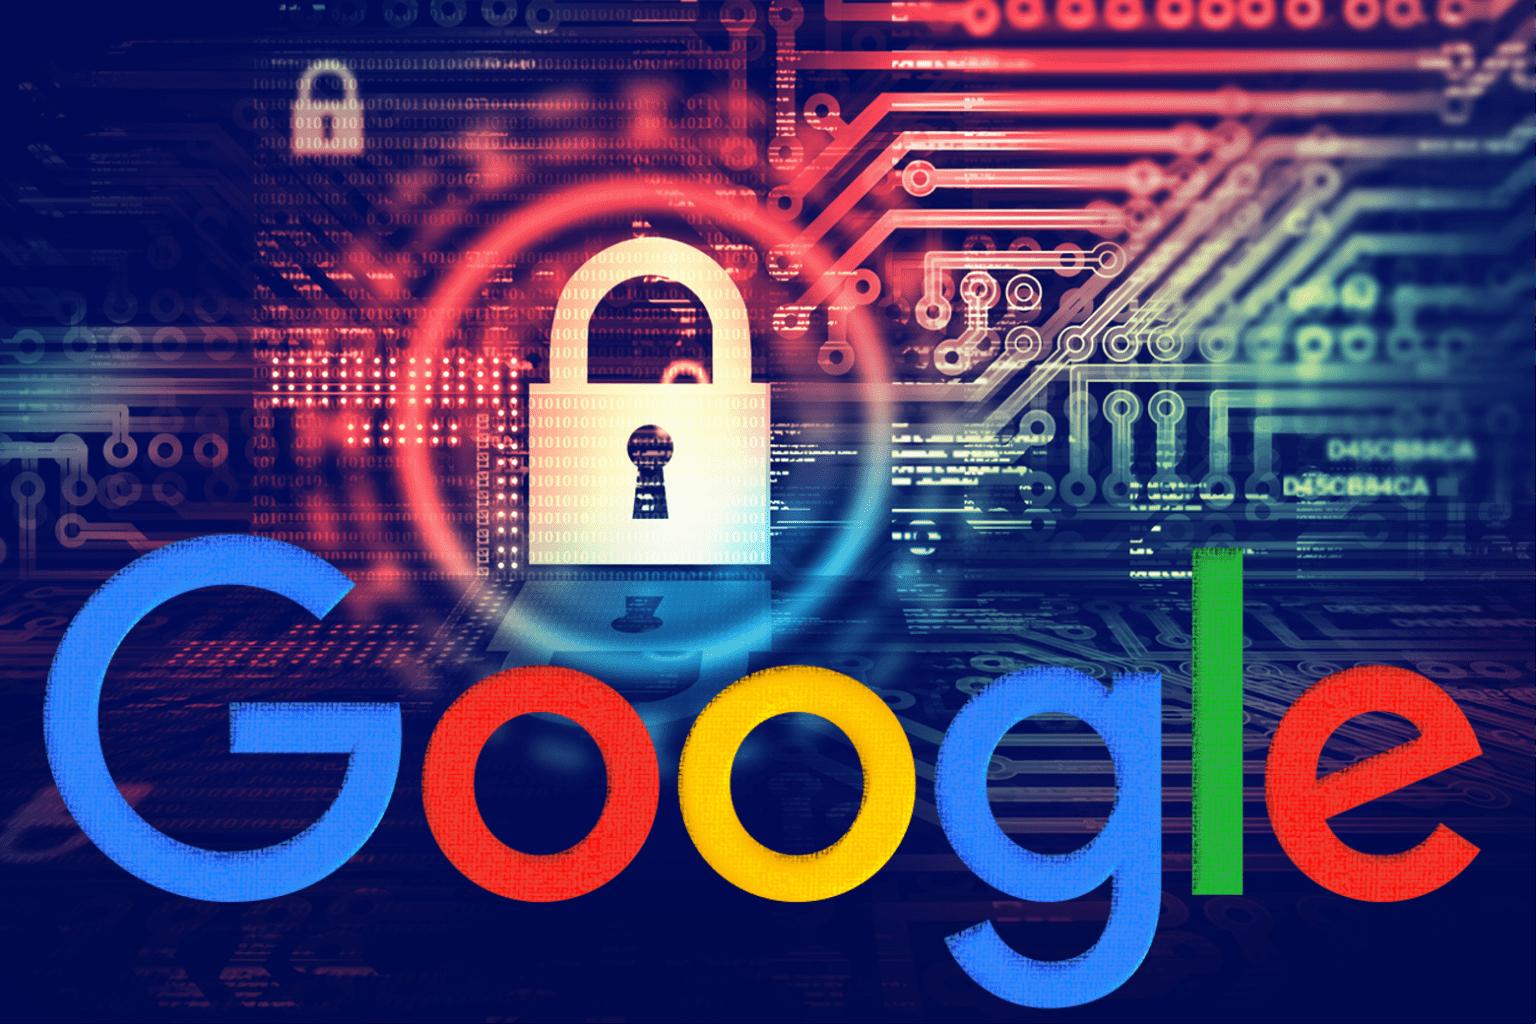 Google reporta una operación que usaba 11 vulnerabilidades 0-day